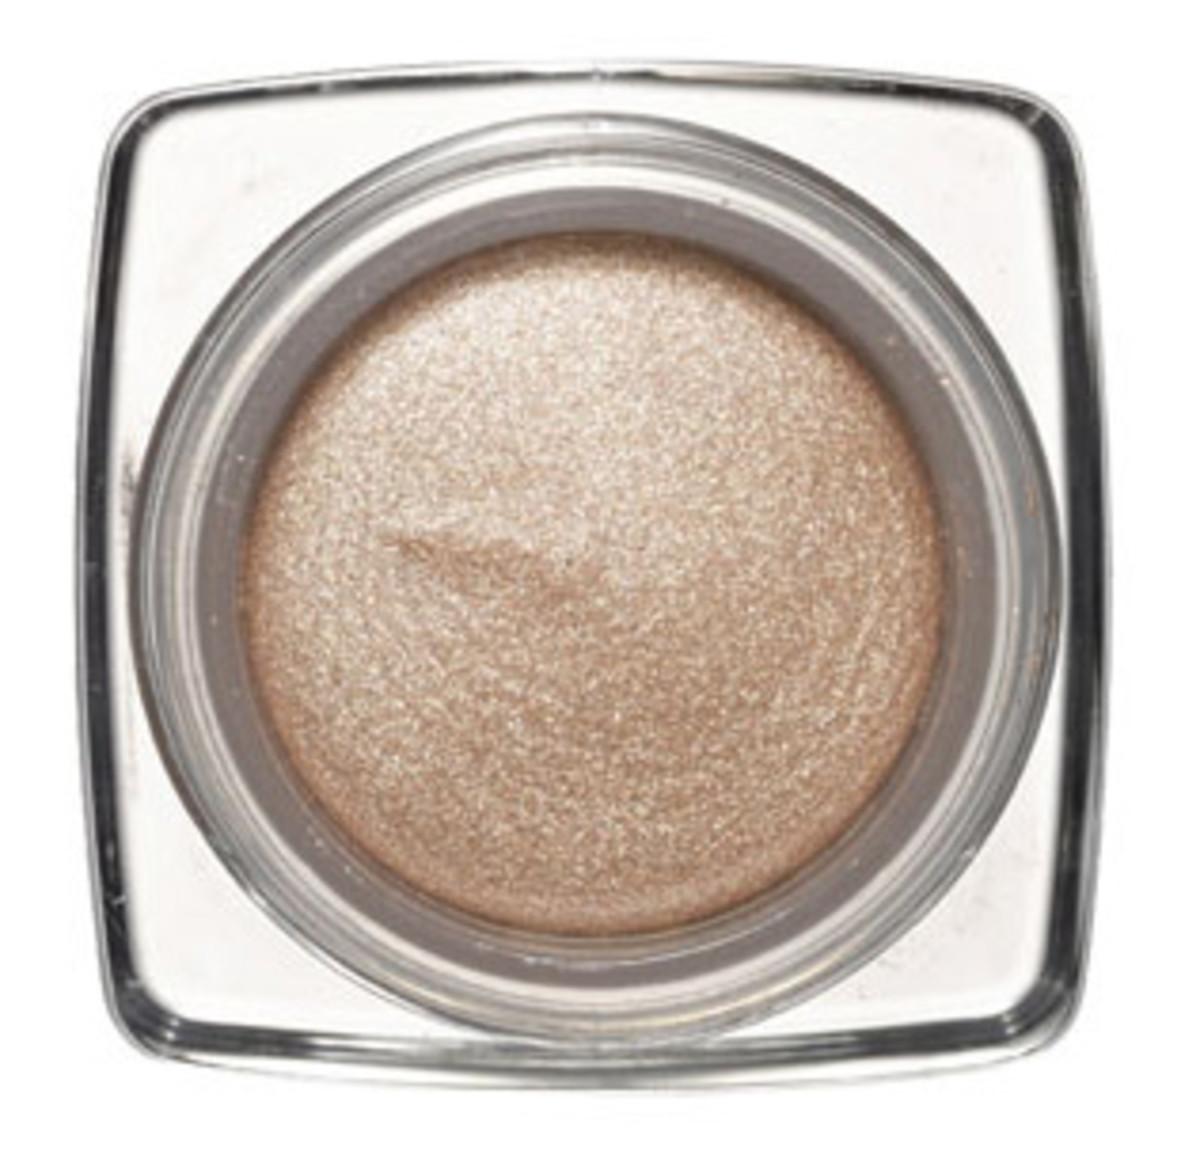 Dior-Ultra-Shimmering-Eyeshadow-in-Undressed-Beige1